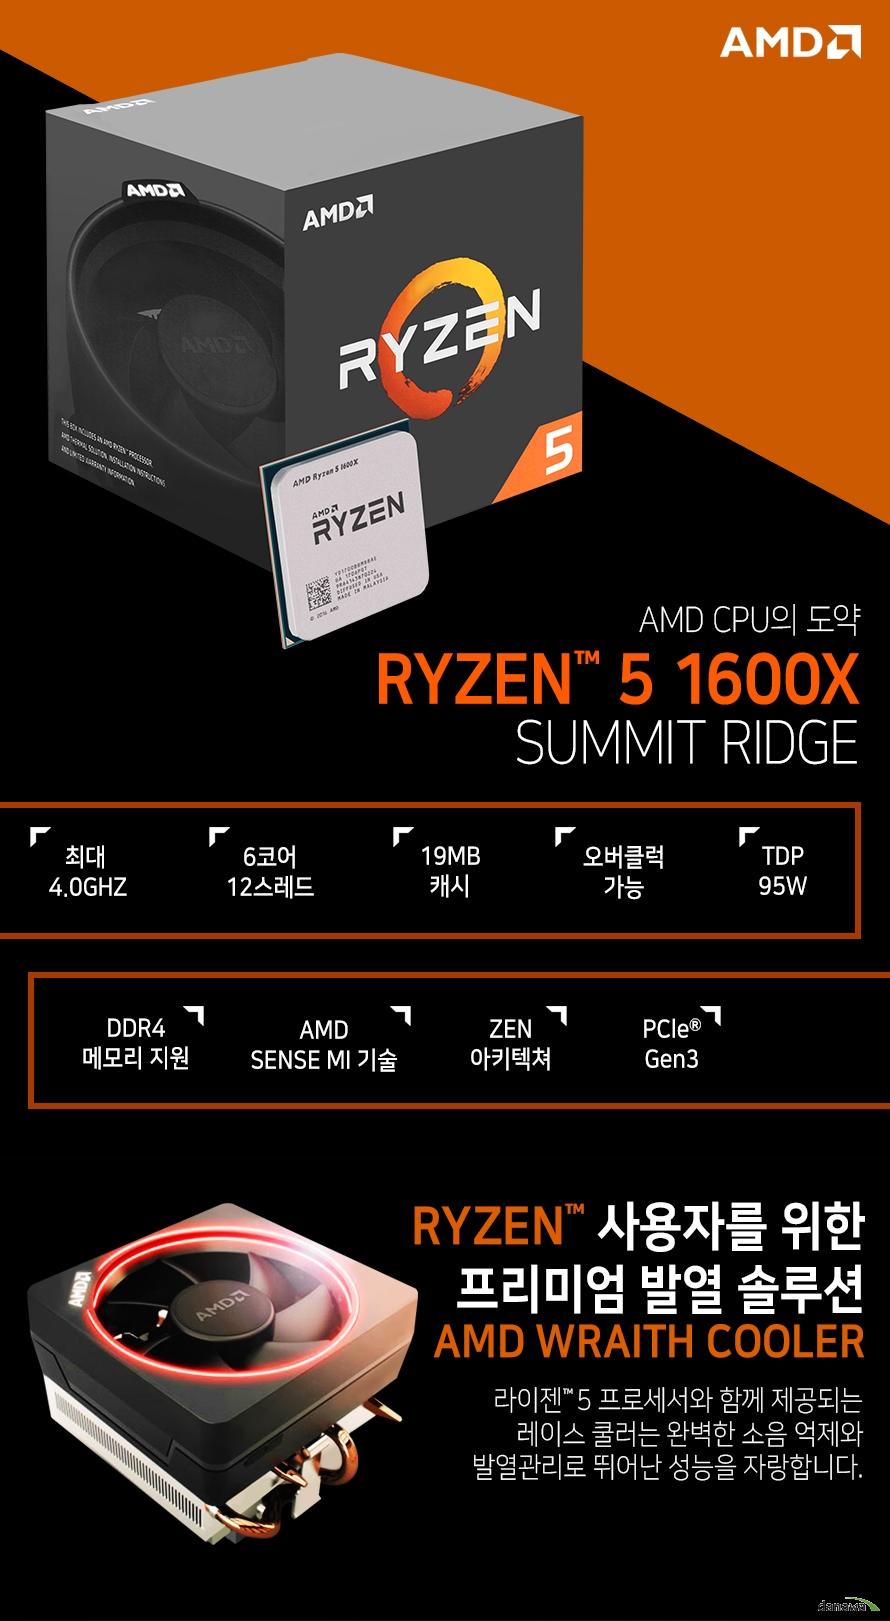 AMD CPU의 도약         RYZEN 5 1600X         SUMMIT RIDGE                  최대 4.0GHZ          6코어 12스레드         19MB 캐시         오버클럭 가능         TDP 95W         DDR4 메모리 지원         AMD SENSE MI 기술         ZEN 아키텍쳐         PCle Gen 3                  RYZEN 사용자를 위한 프리미엄 발열 솔루션         AMD WRAITH COOLER                  라이젠 5 프로세서와 함께 제공되는 레이스 쿨러는          완벽한 소음 억제와 발열관리로 뛰어난 성능을 자랑합니다.